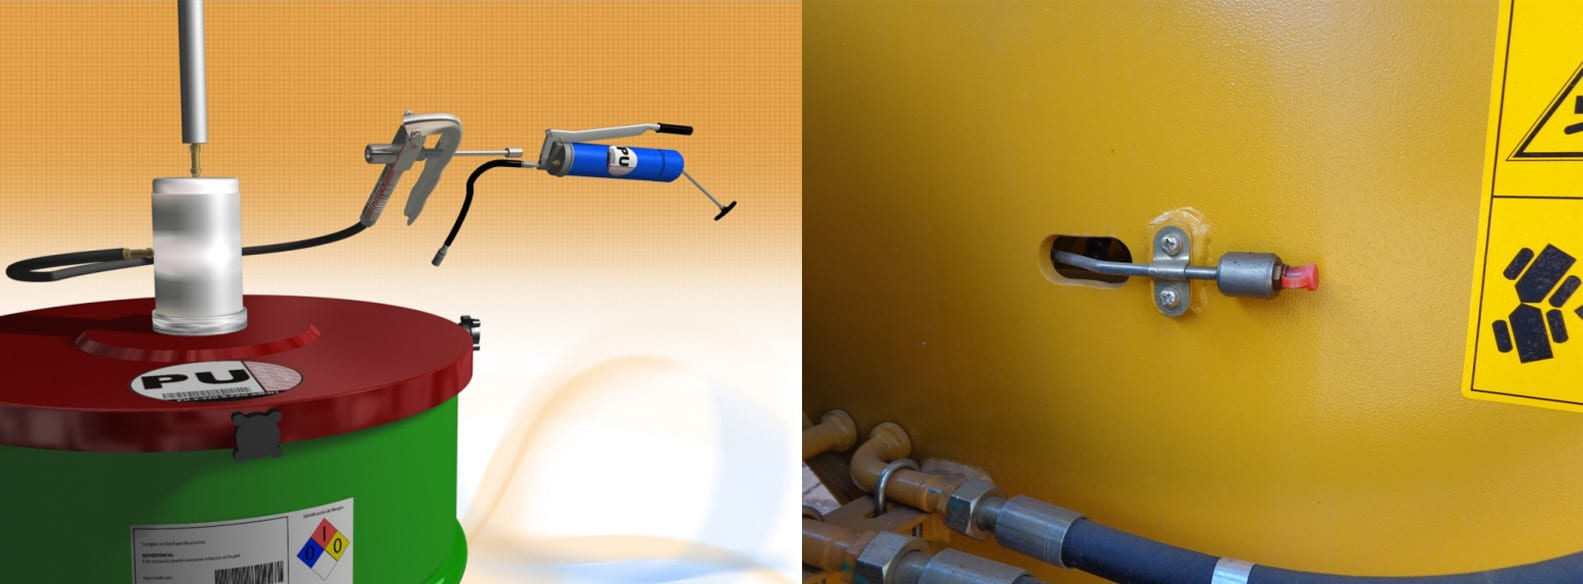 Figuras 5/6 - Sistema pneumático para enchimento de pistolas graxeiras e capa para pino graxeiro: métodos para evitar a contaminação da graxa